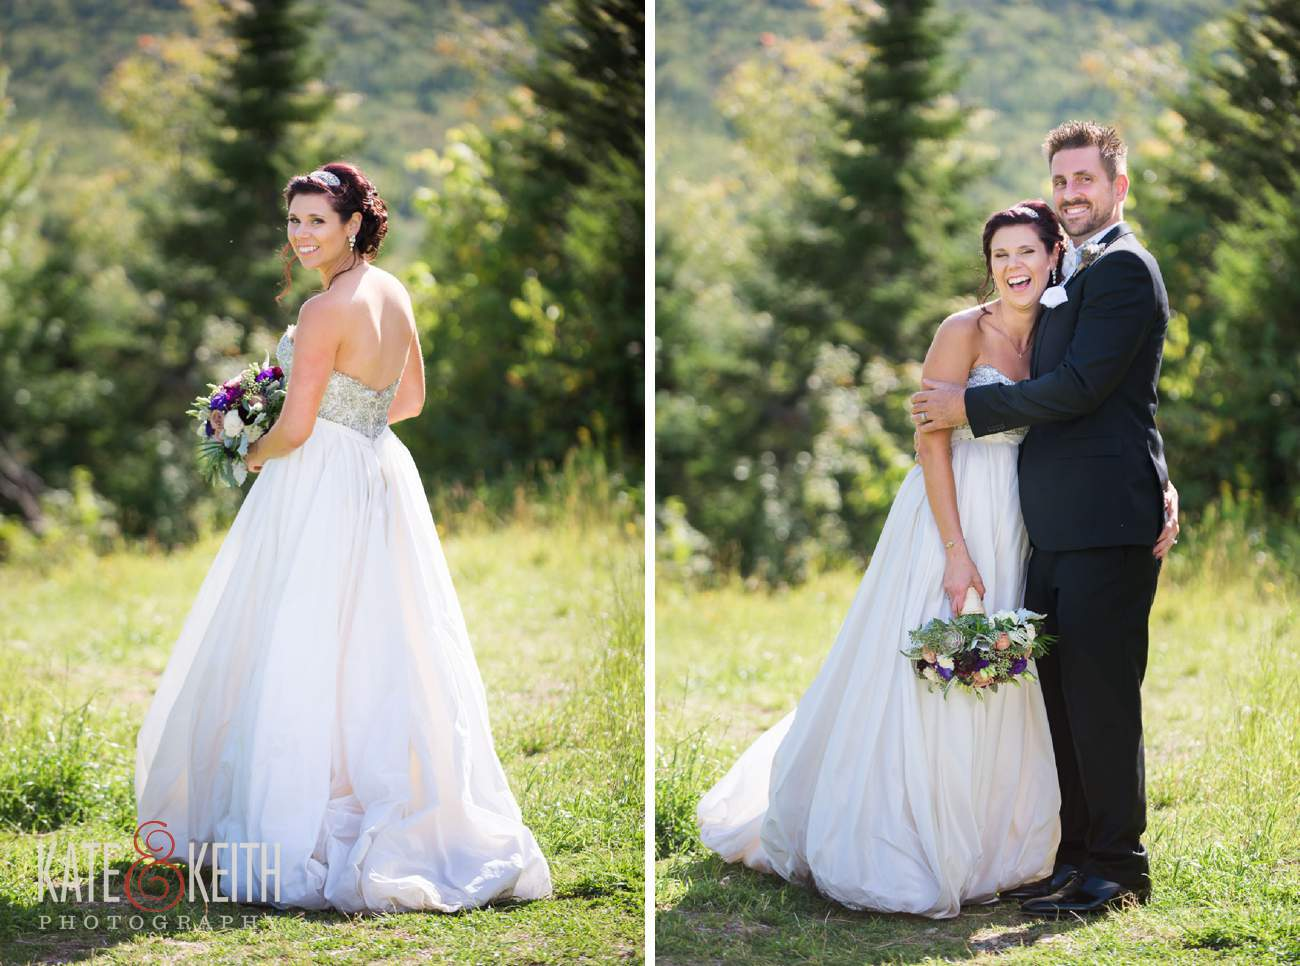 Loon mountain nh wedding